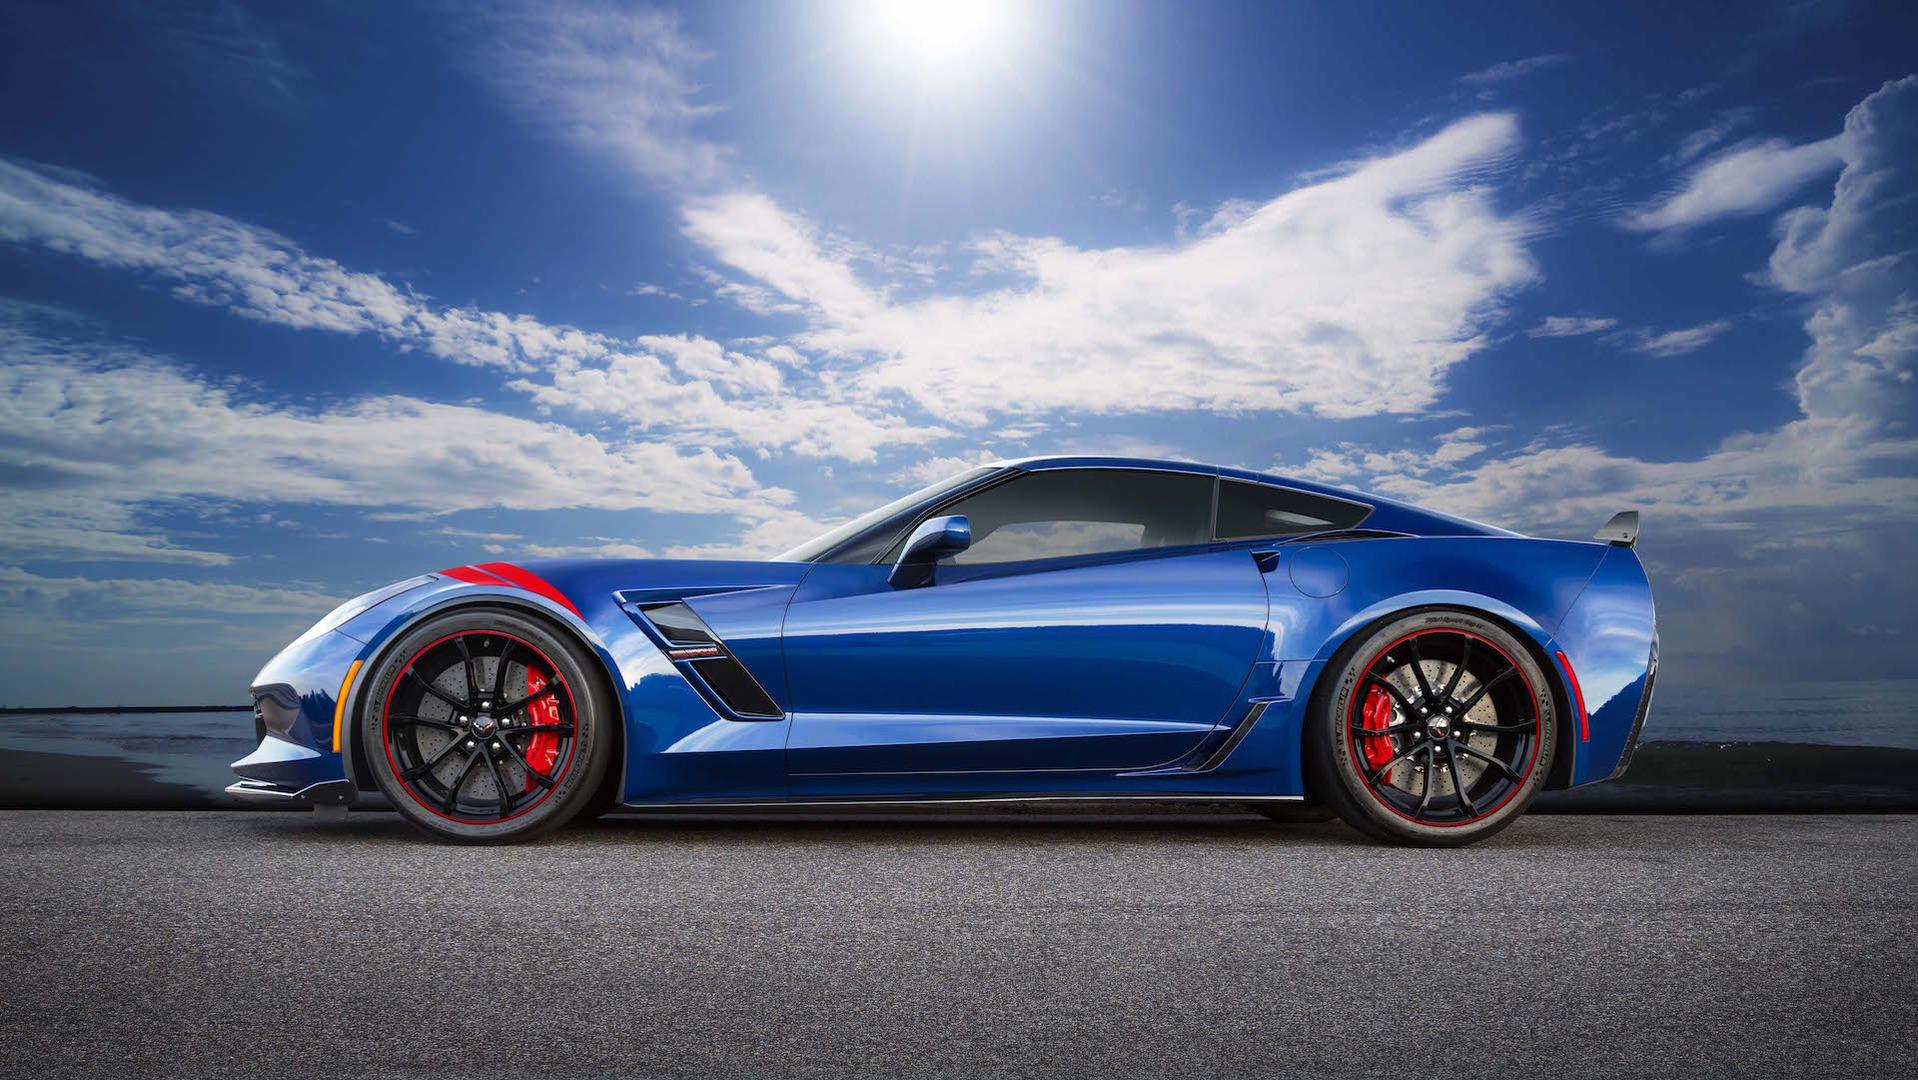 Chevrolet Corvette Grand Sport Heritage Edition